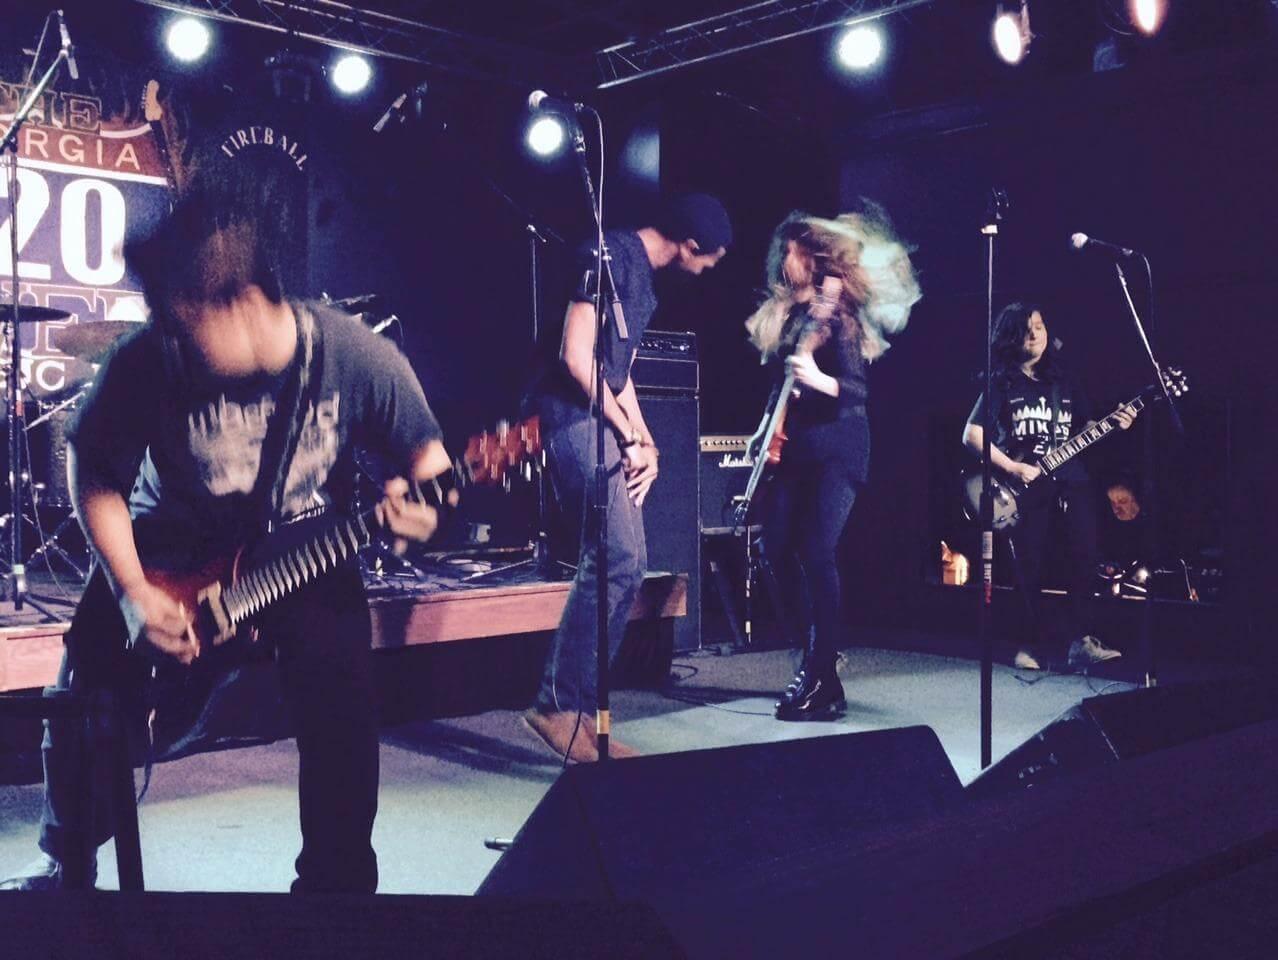 House Band Event, Dec 2015.